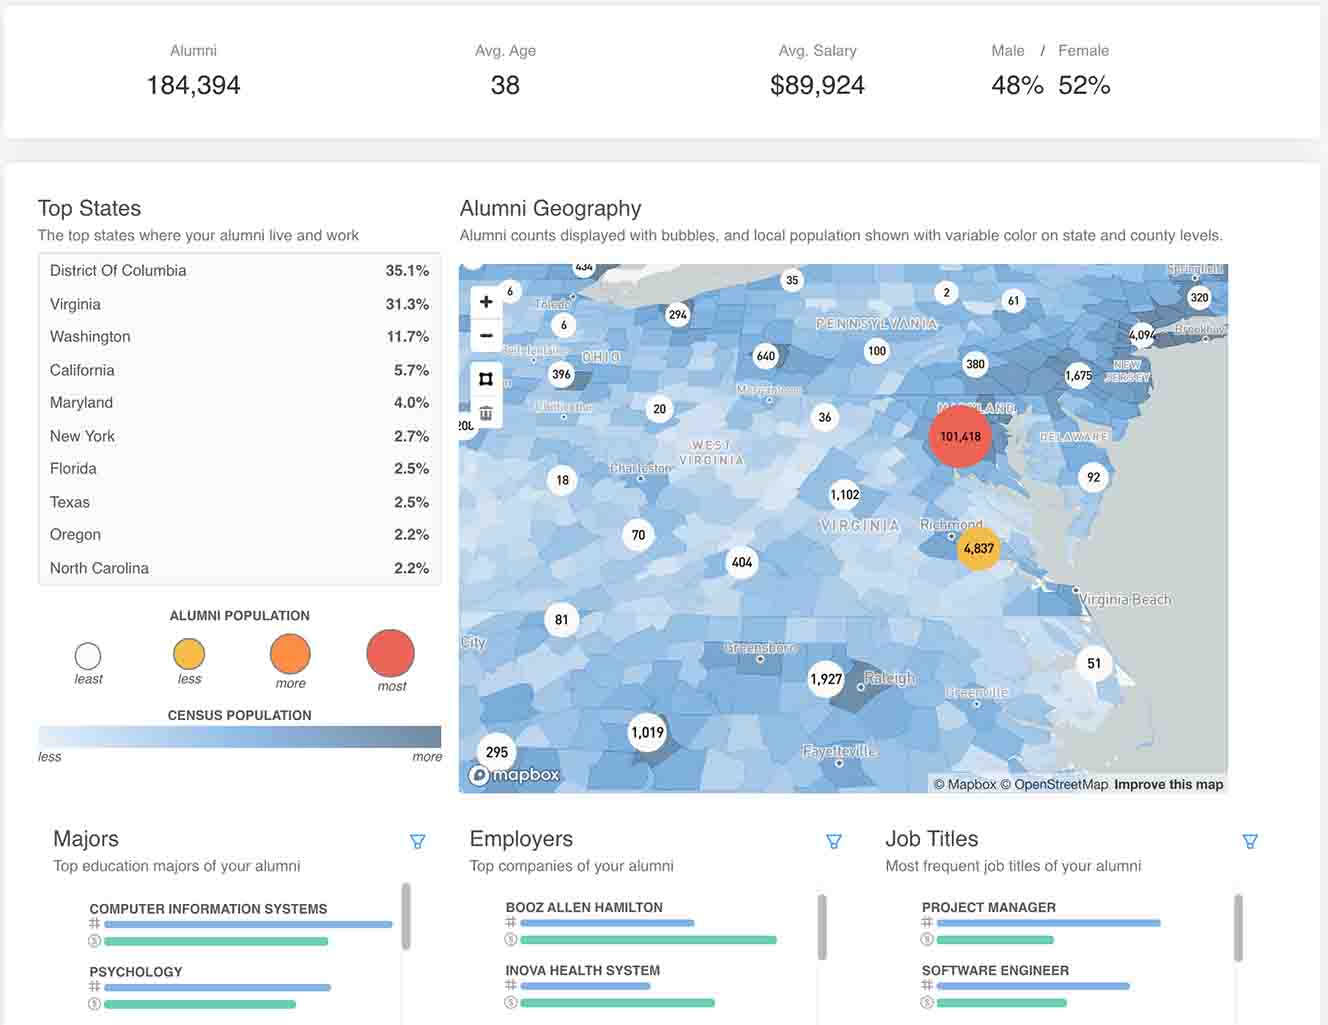 Steppingblocks Alumni Career Analytics and Workforce Data